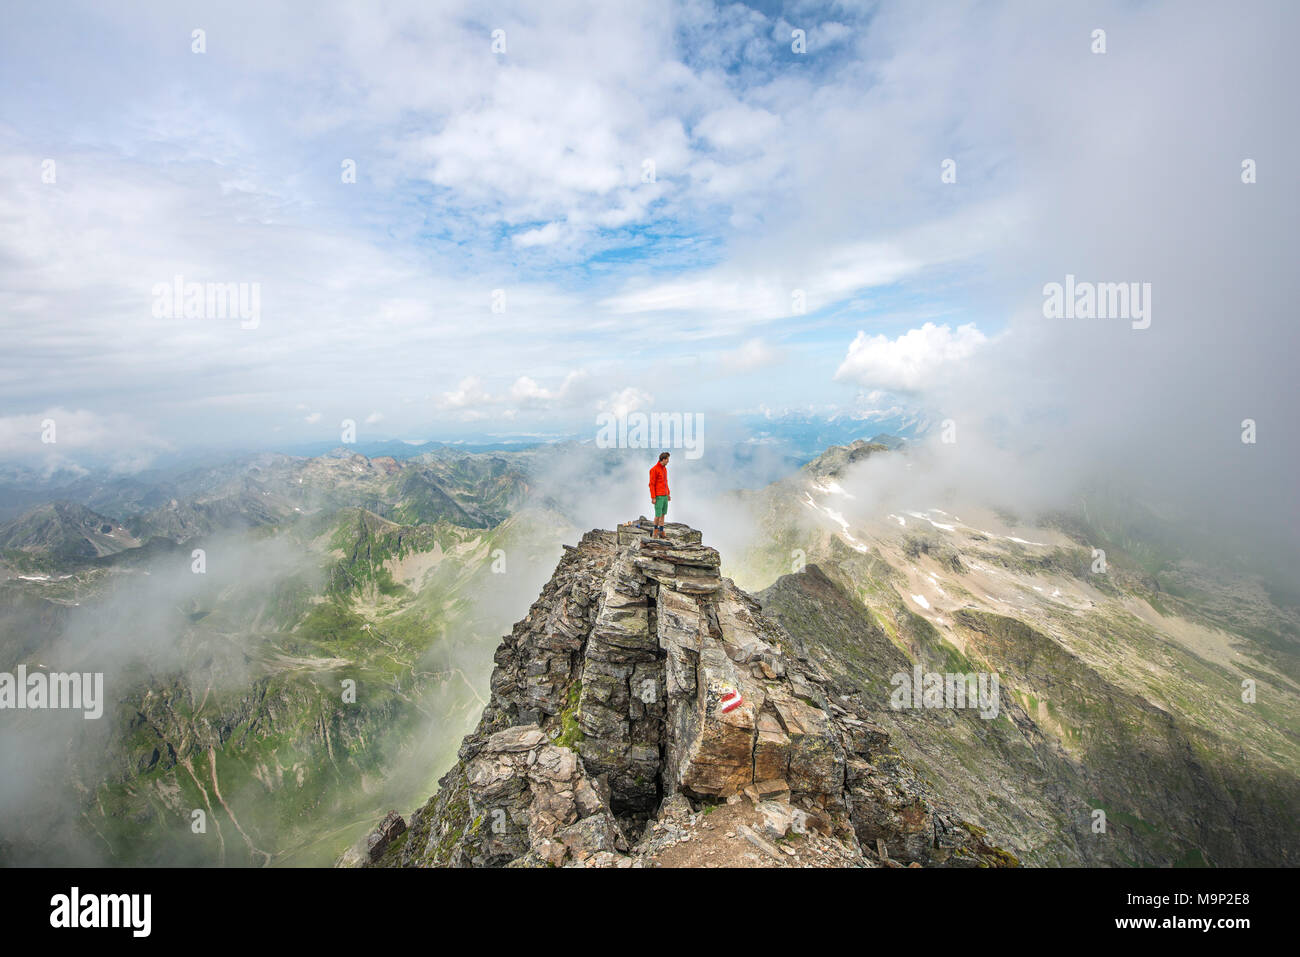 Hiker on the summit of the Hochgolling with rising fog, Schladminger Höhenweg, Schladminger Tauern, Schladming, Steiermark - Stock Image